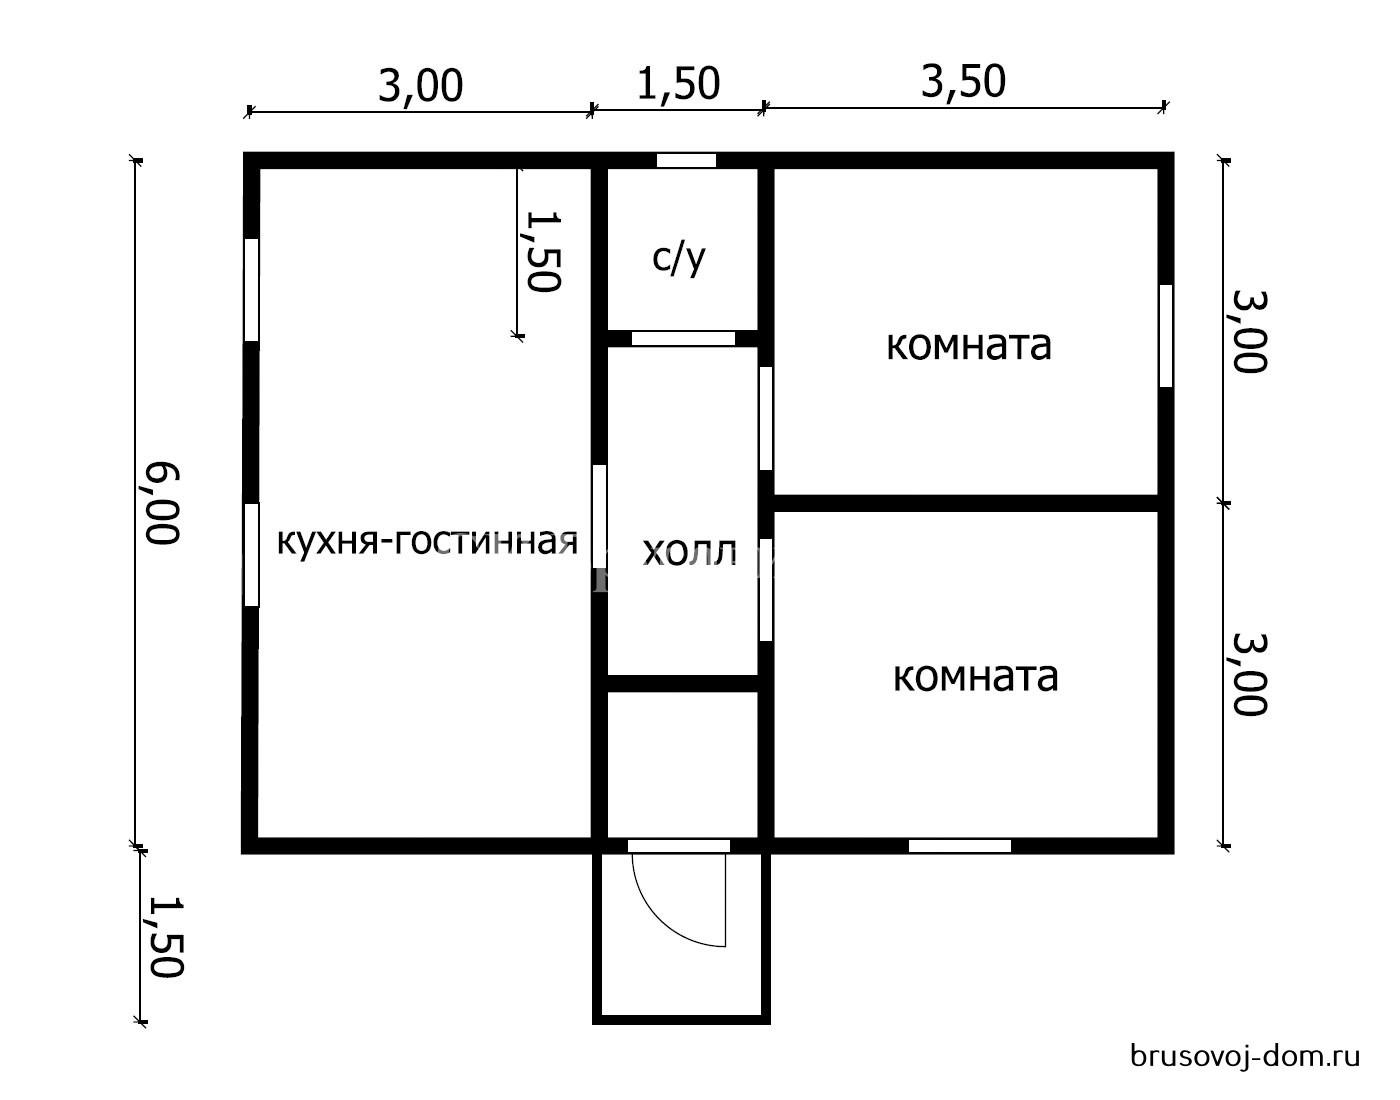 Дом из бруса под  усадку 6х8 м Колтуши